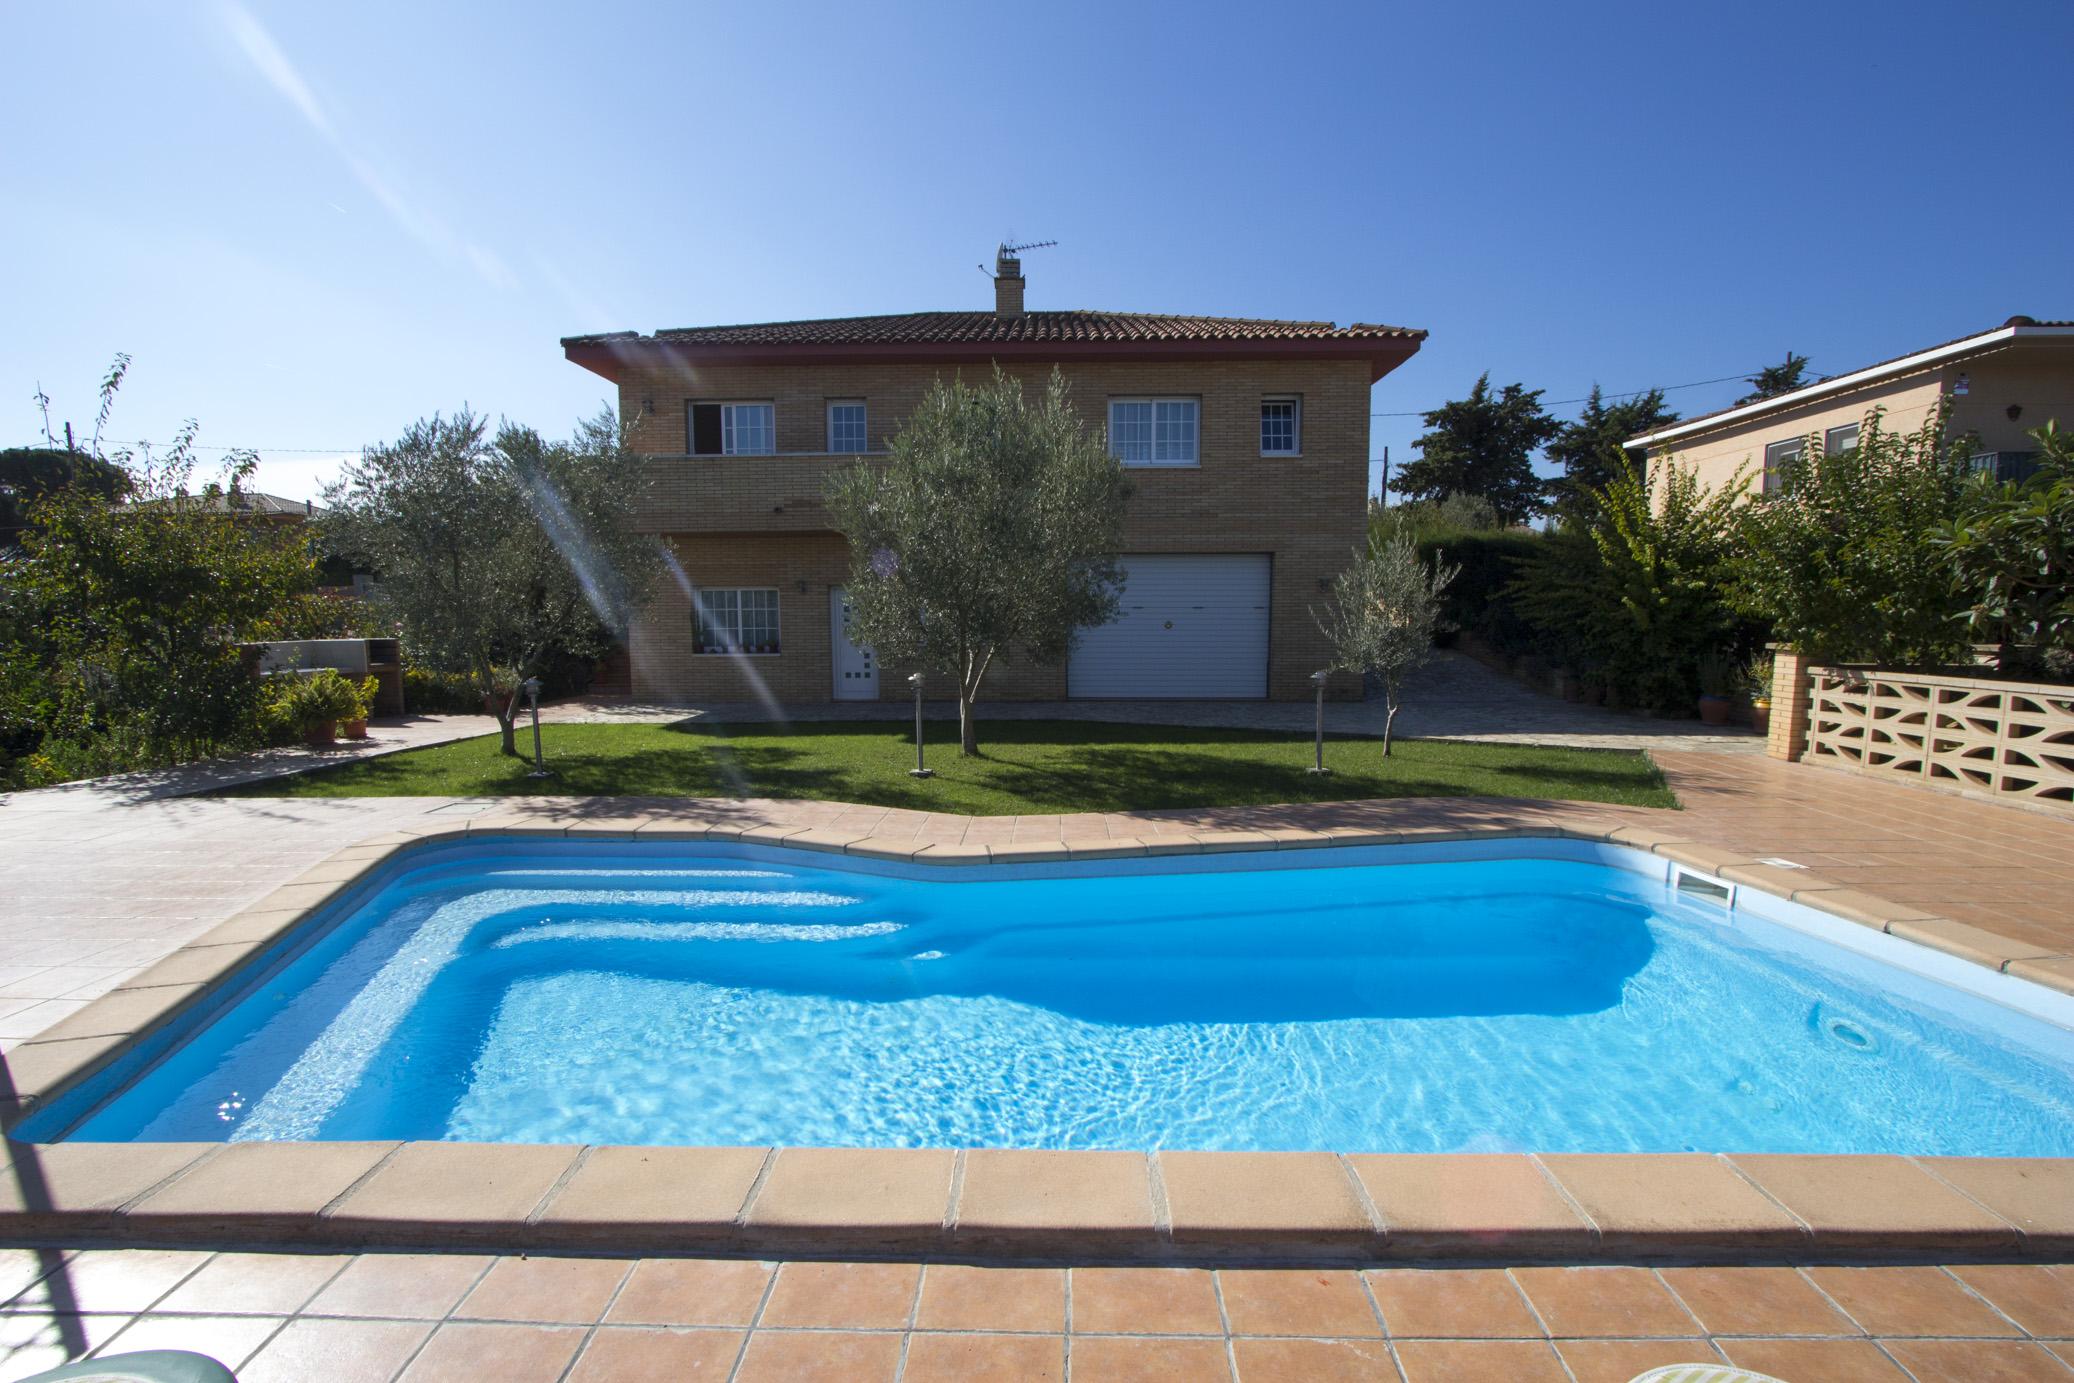 Ferienhaus Catalunya Casas: Incredible Villa in Sils, a short drive to Costa Brava beaches! (1890893), Les Mallorquines, Girona, Katalonien, Spanien, Bild 2